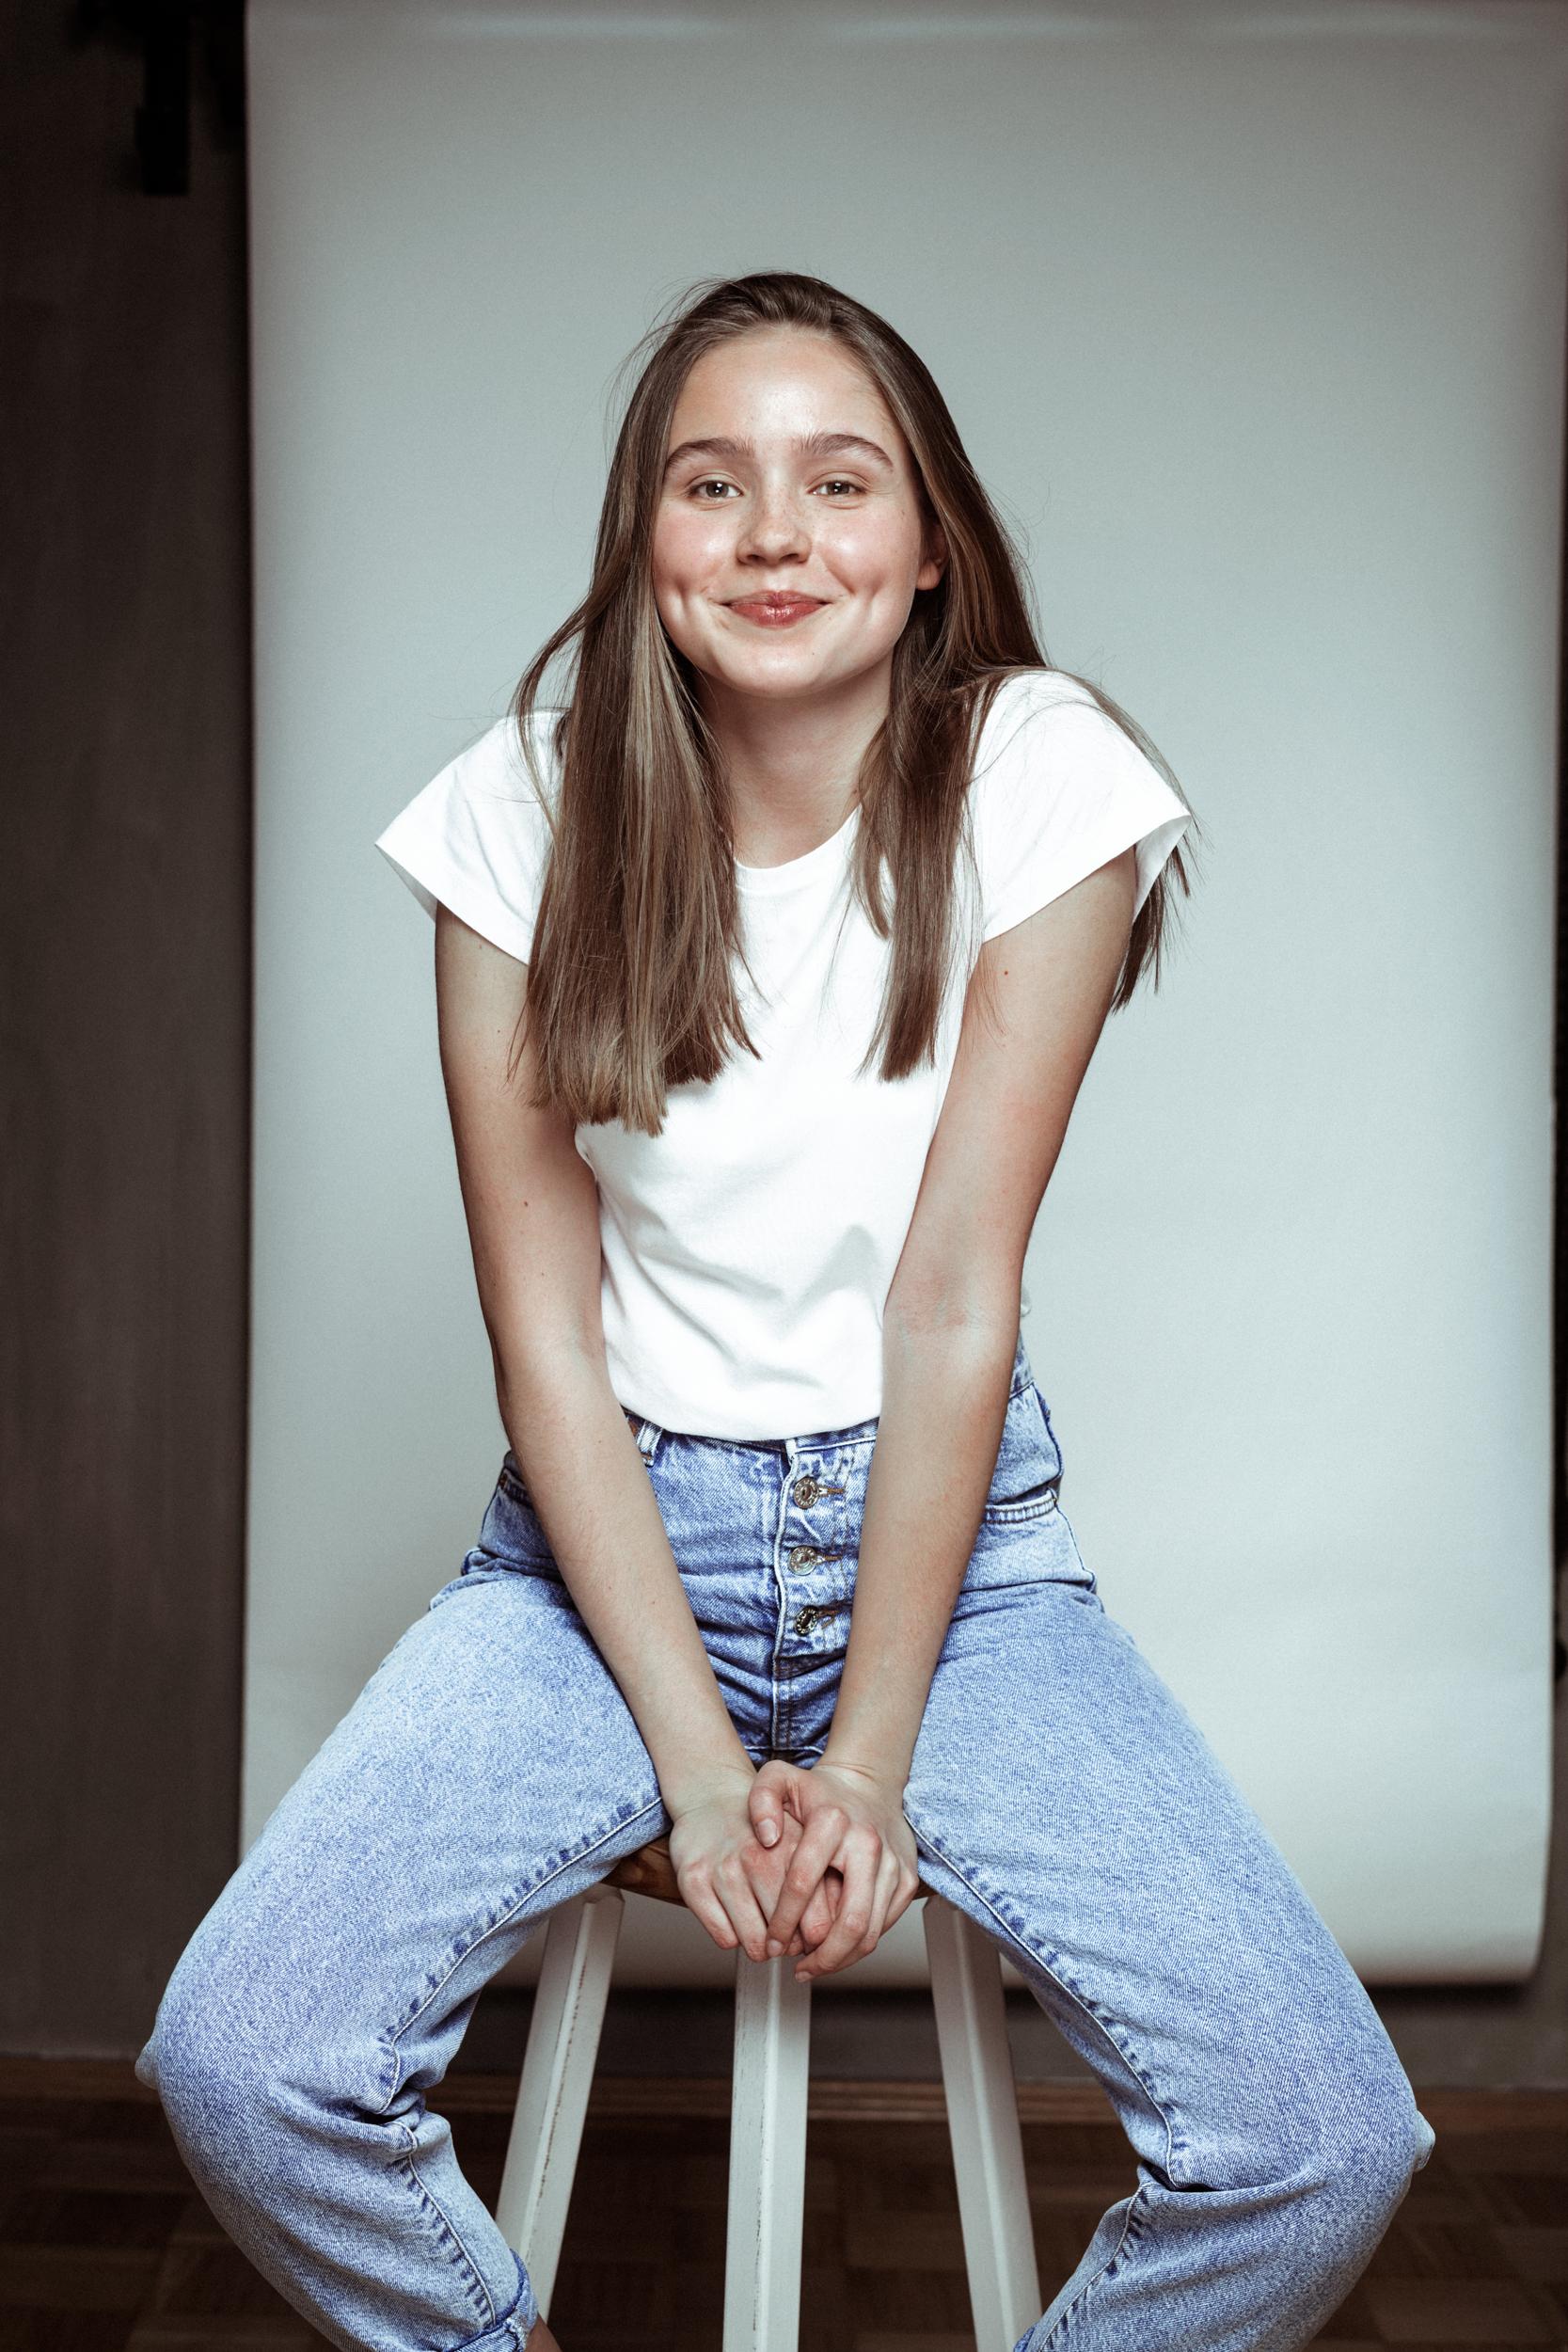 Paulina Hobratschk